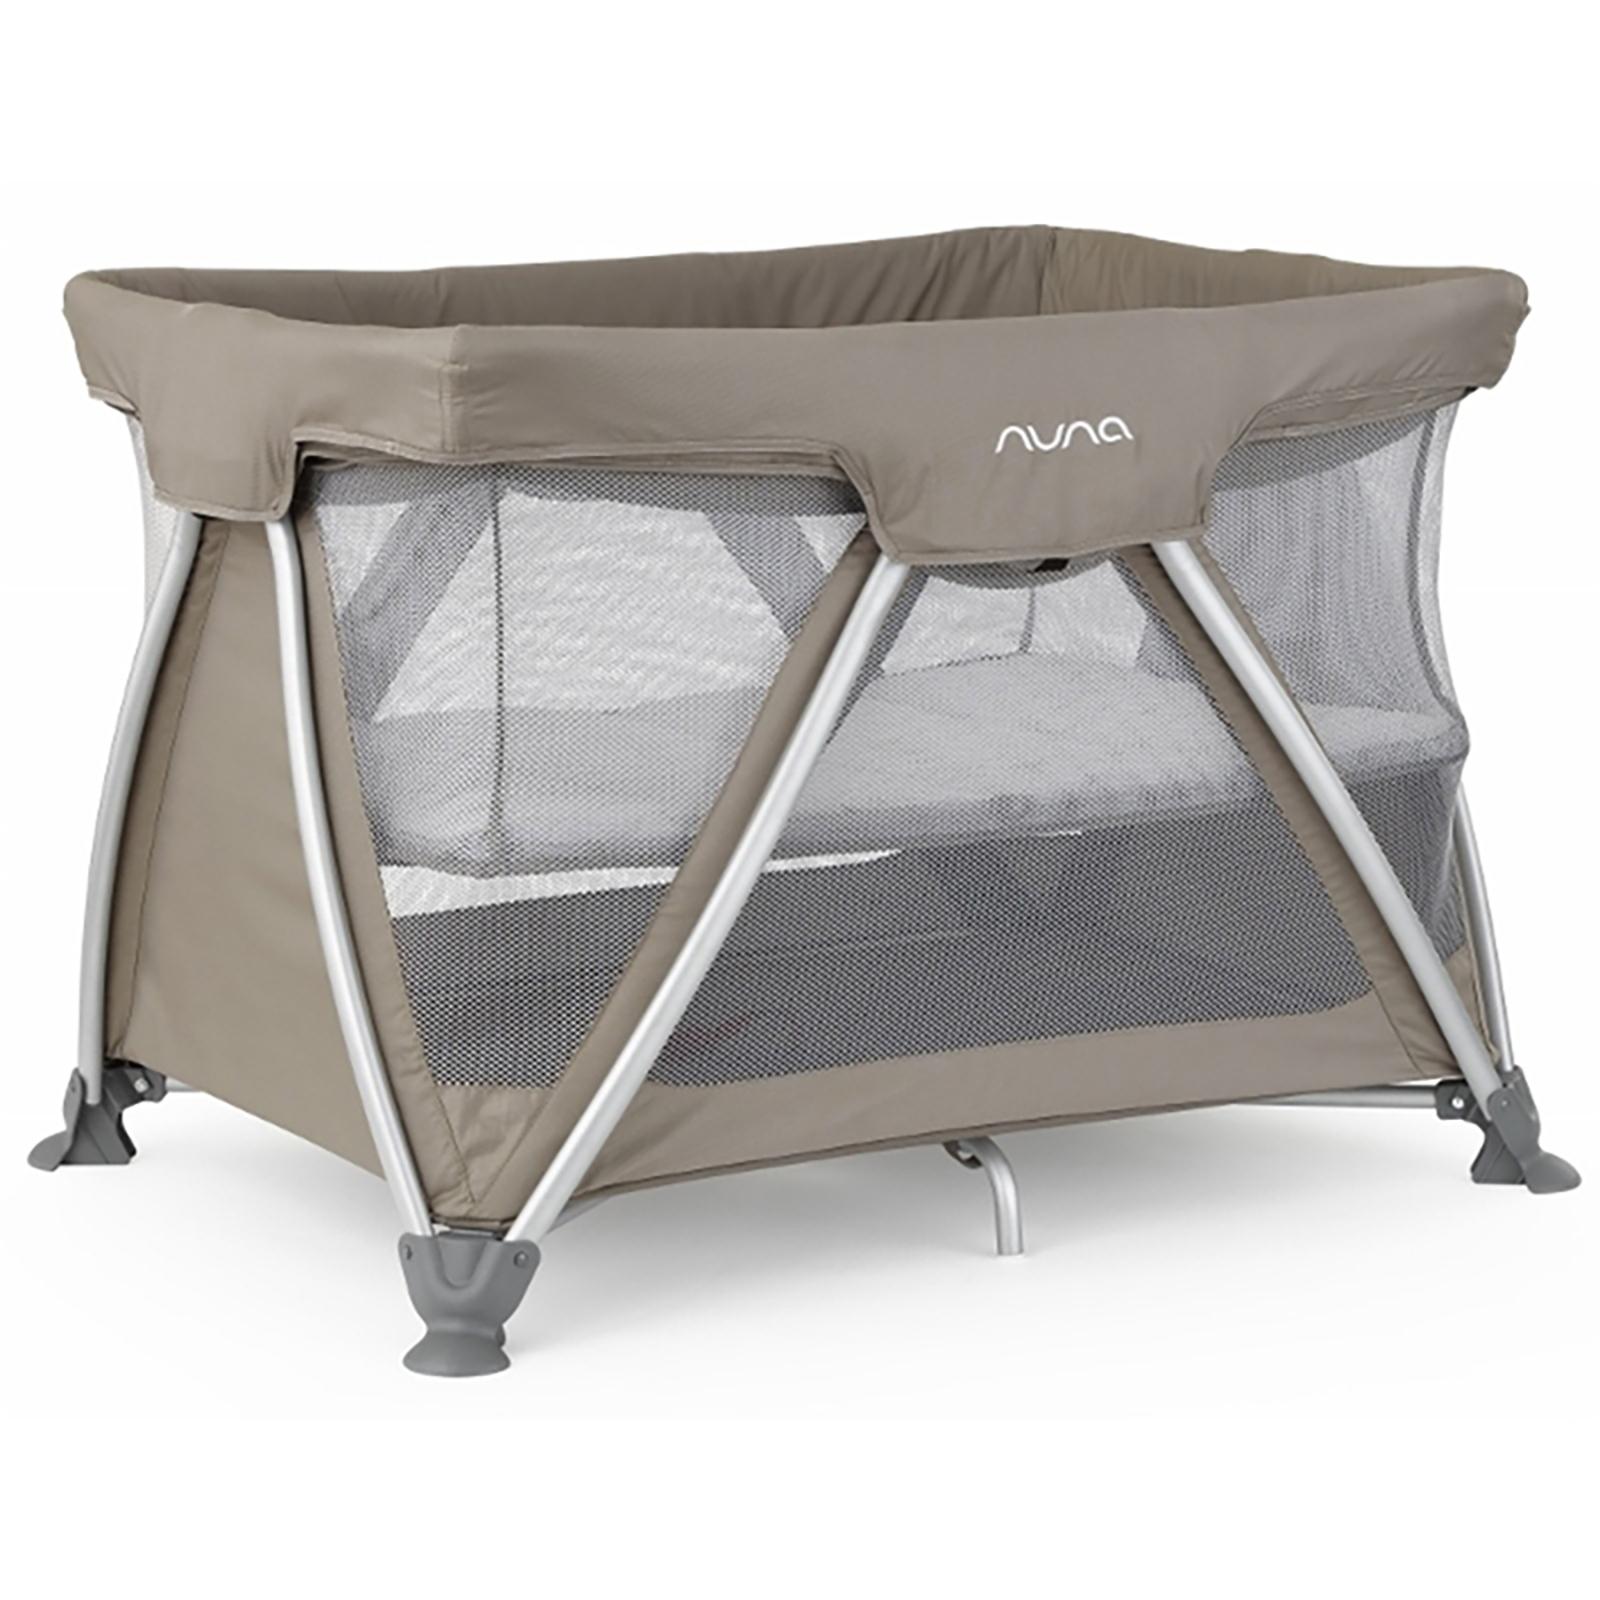 Nuna Sena Bassinet Travel Cot - Safari £94.95 delivered with code @ Online 4 Baby